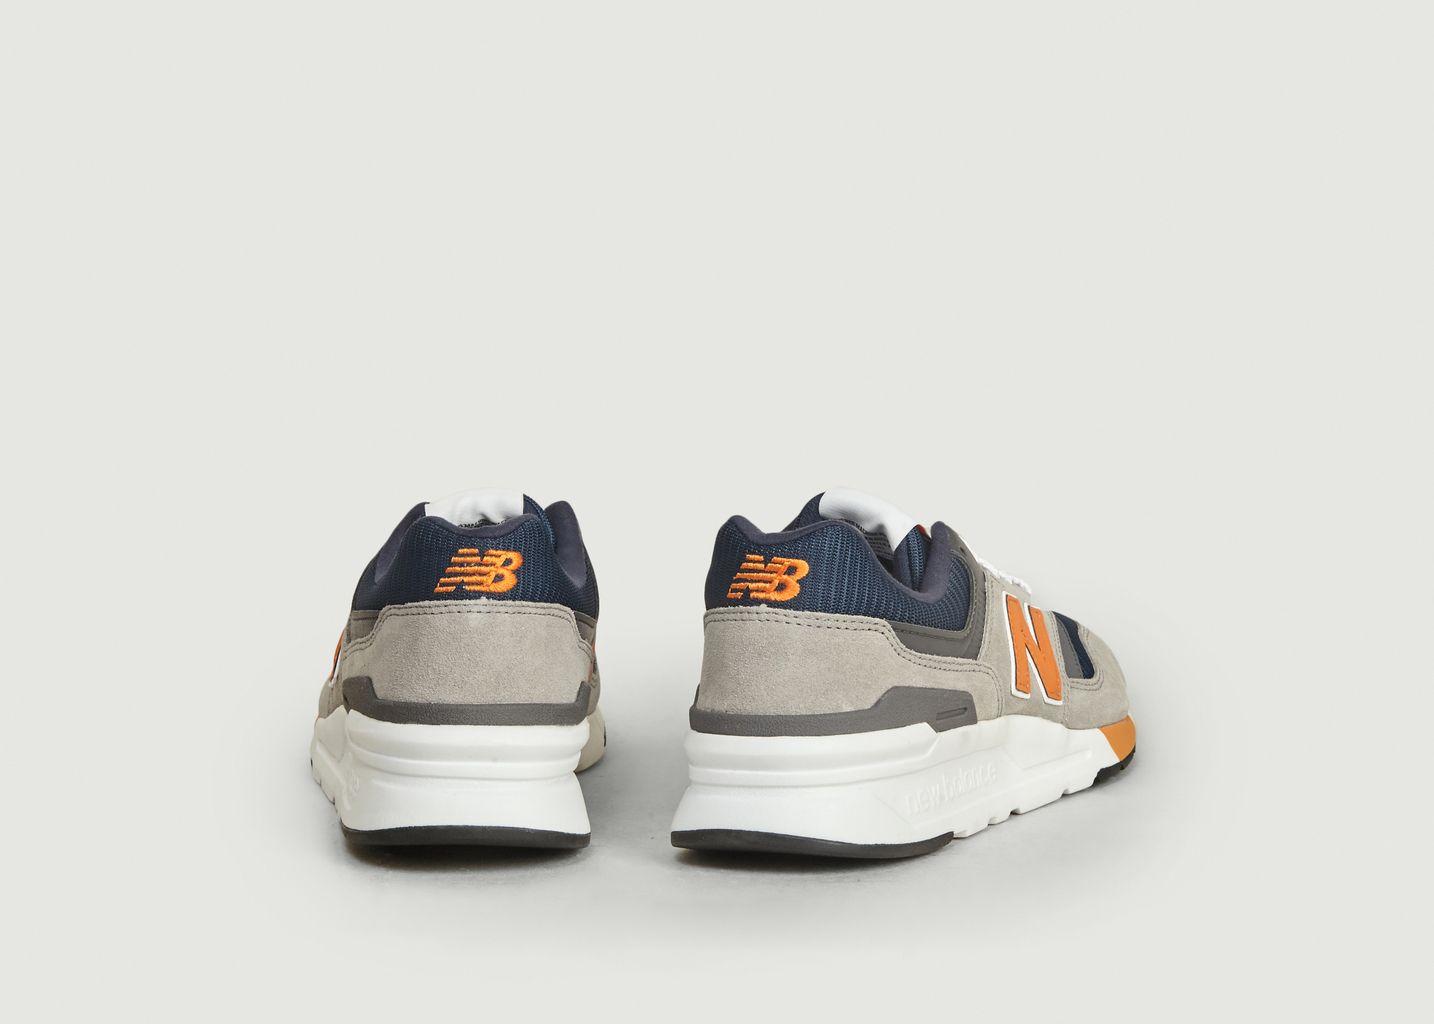 new balance 997h homme bleu orange